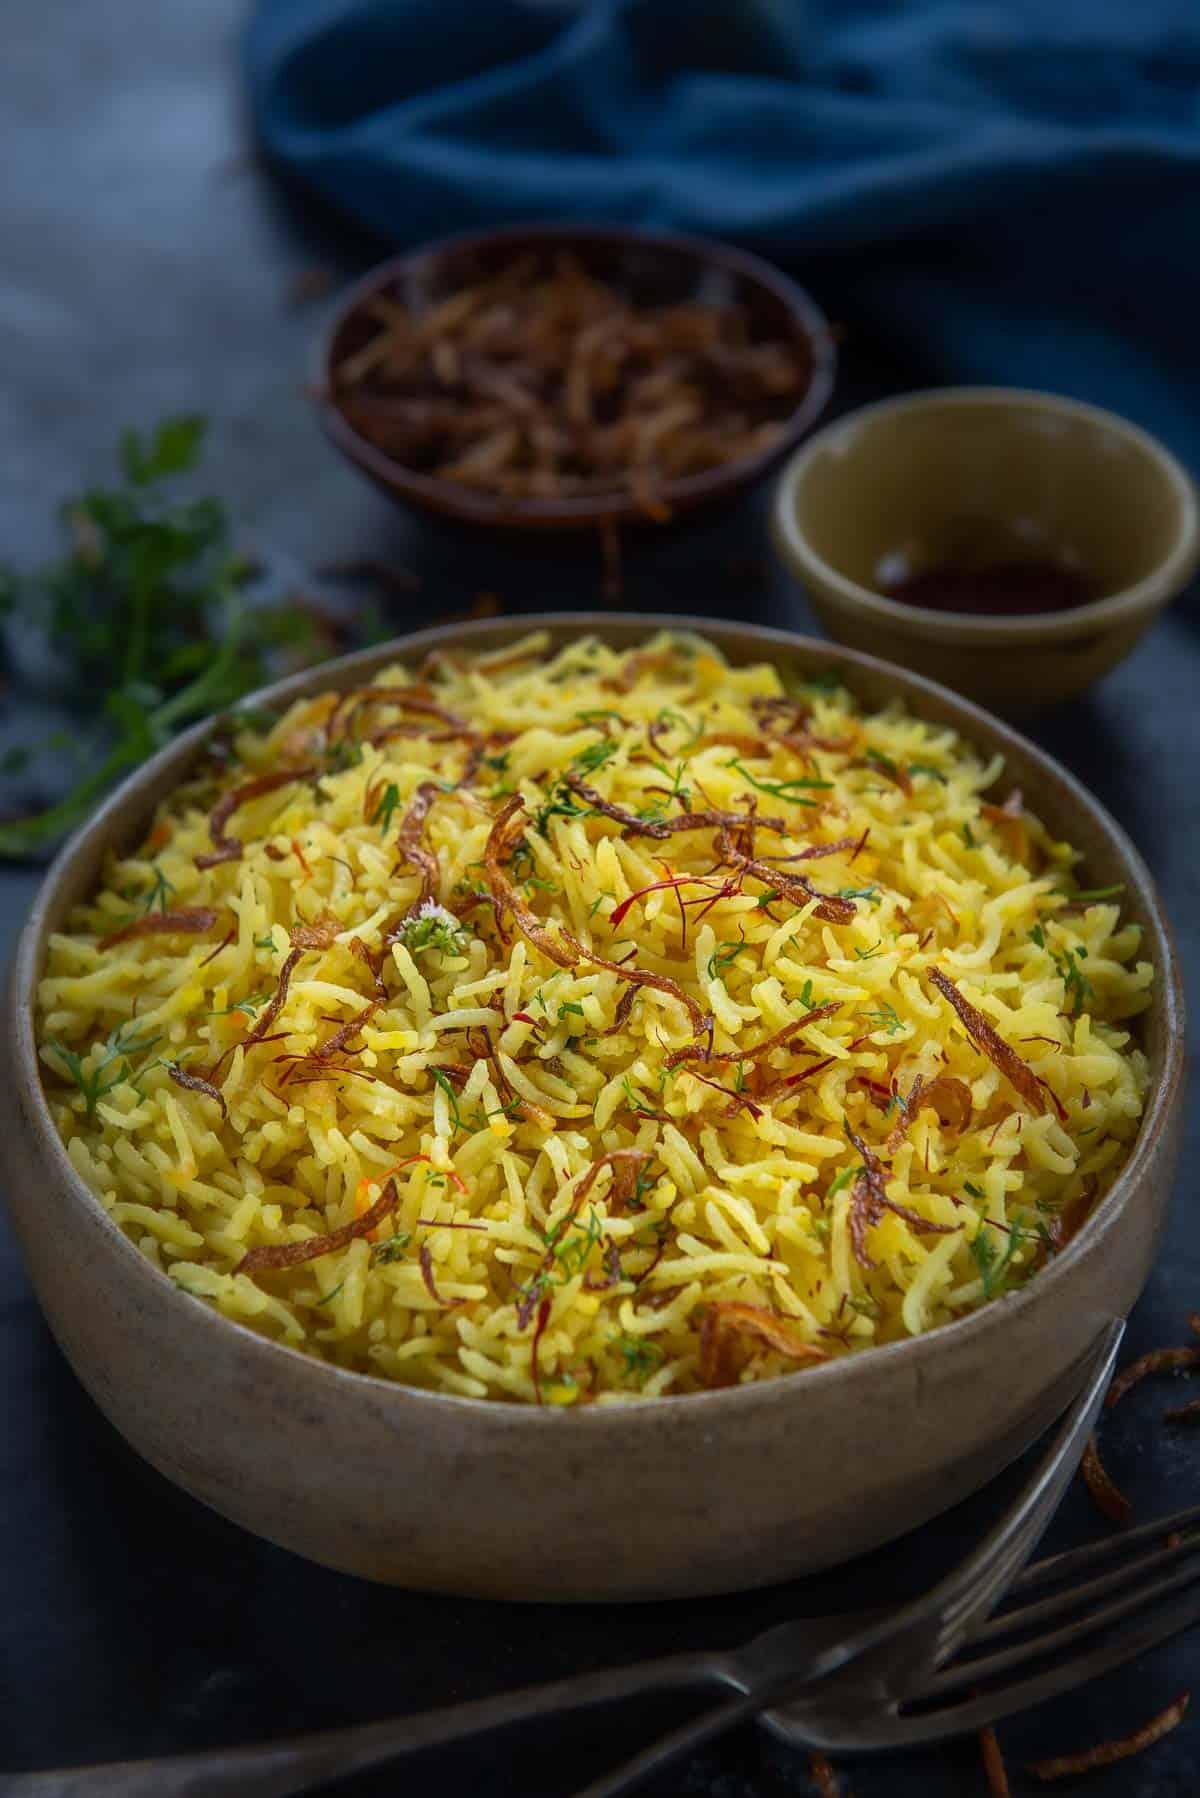 Saffron rice served in a bowl.